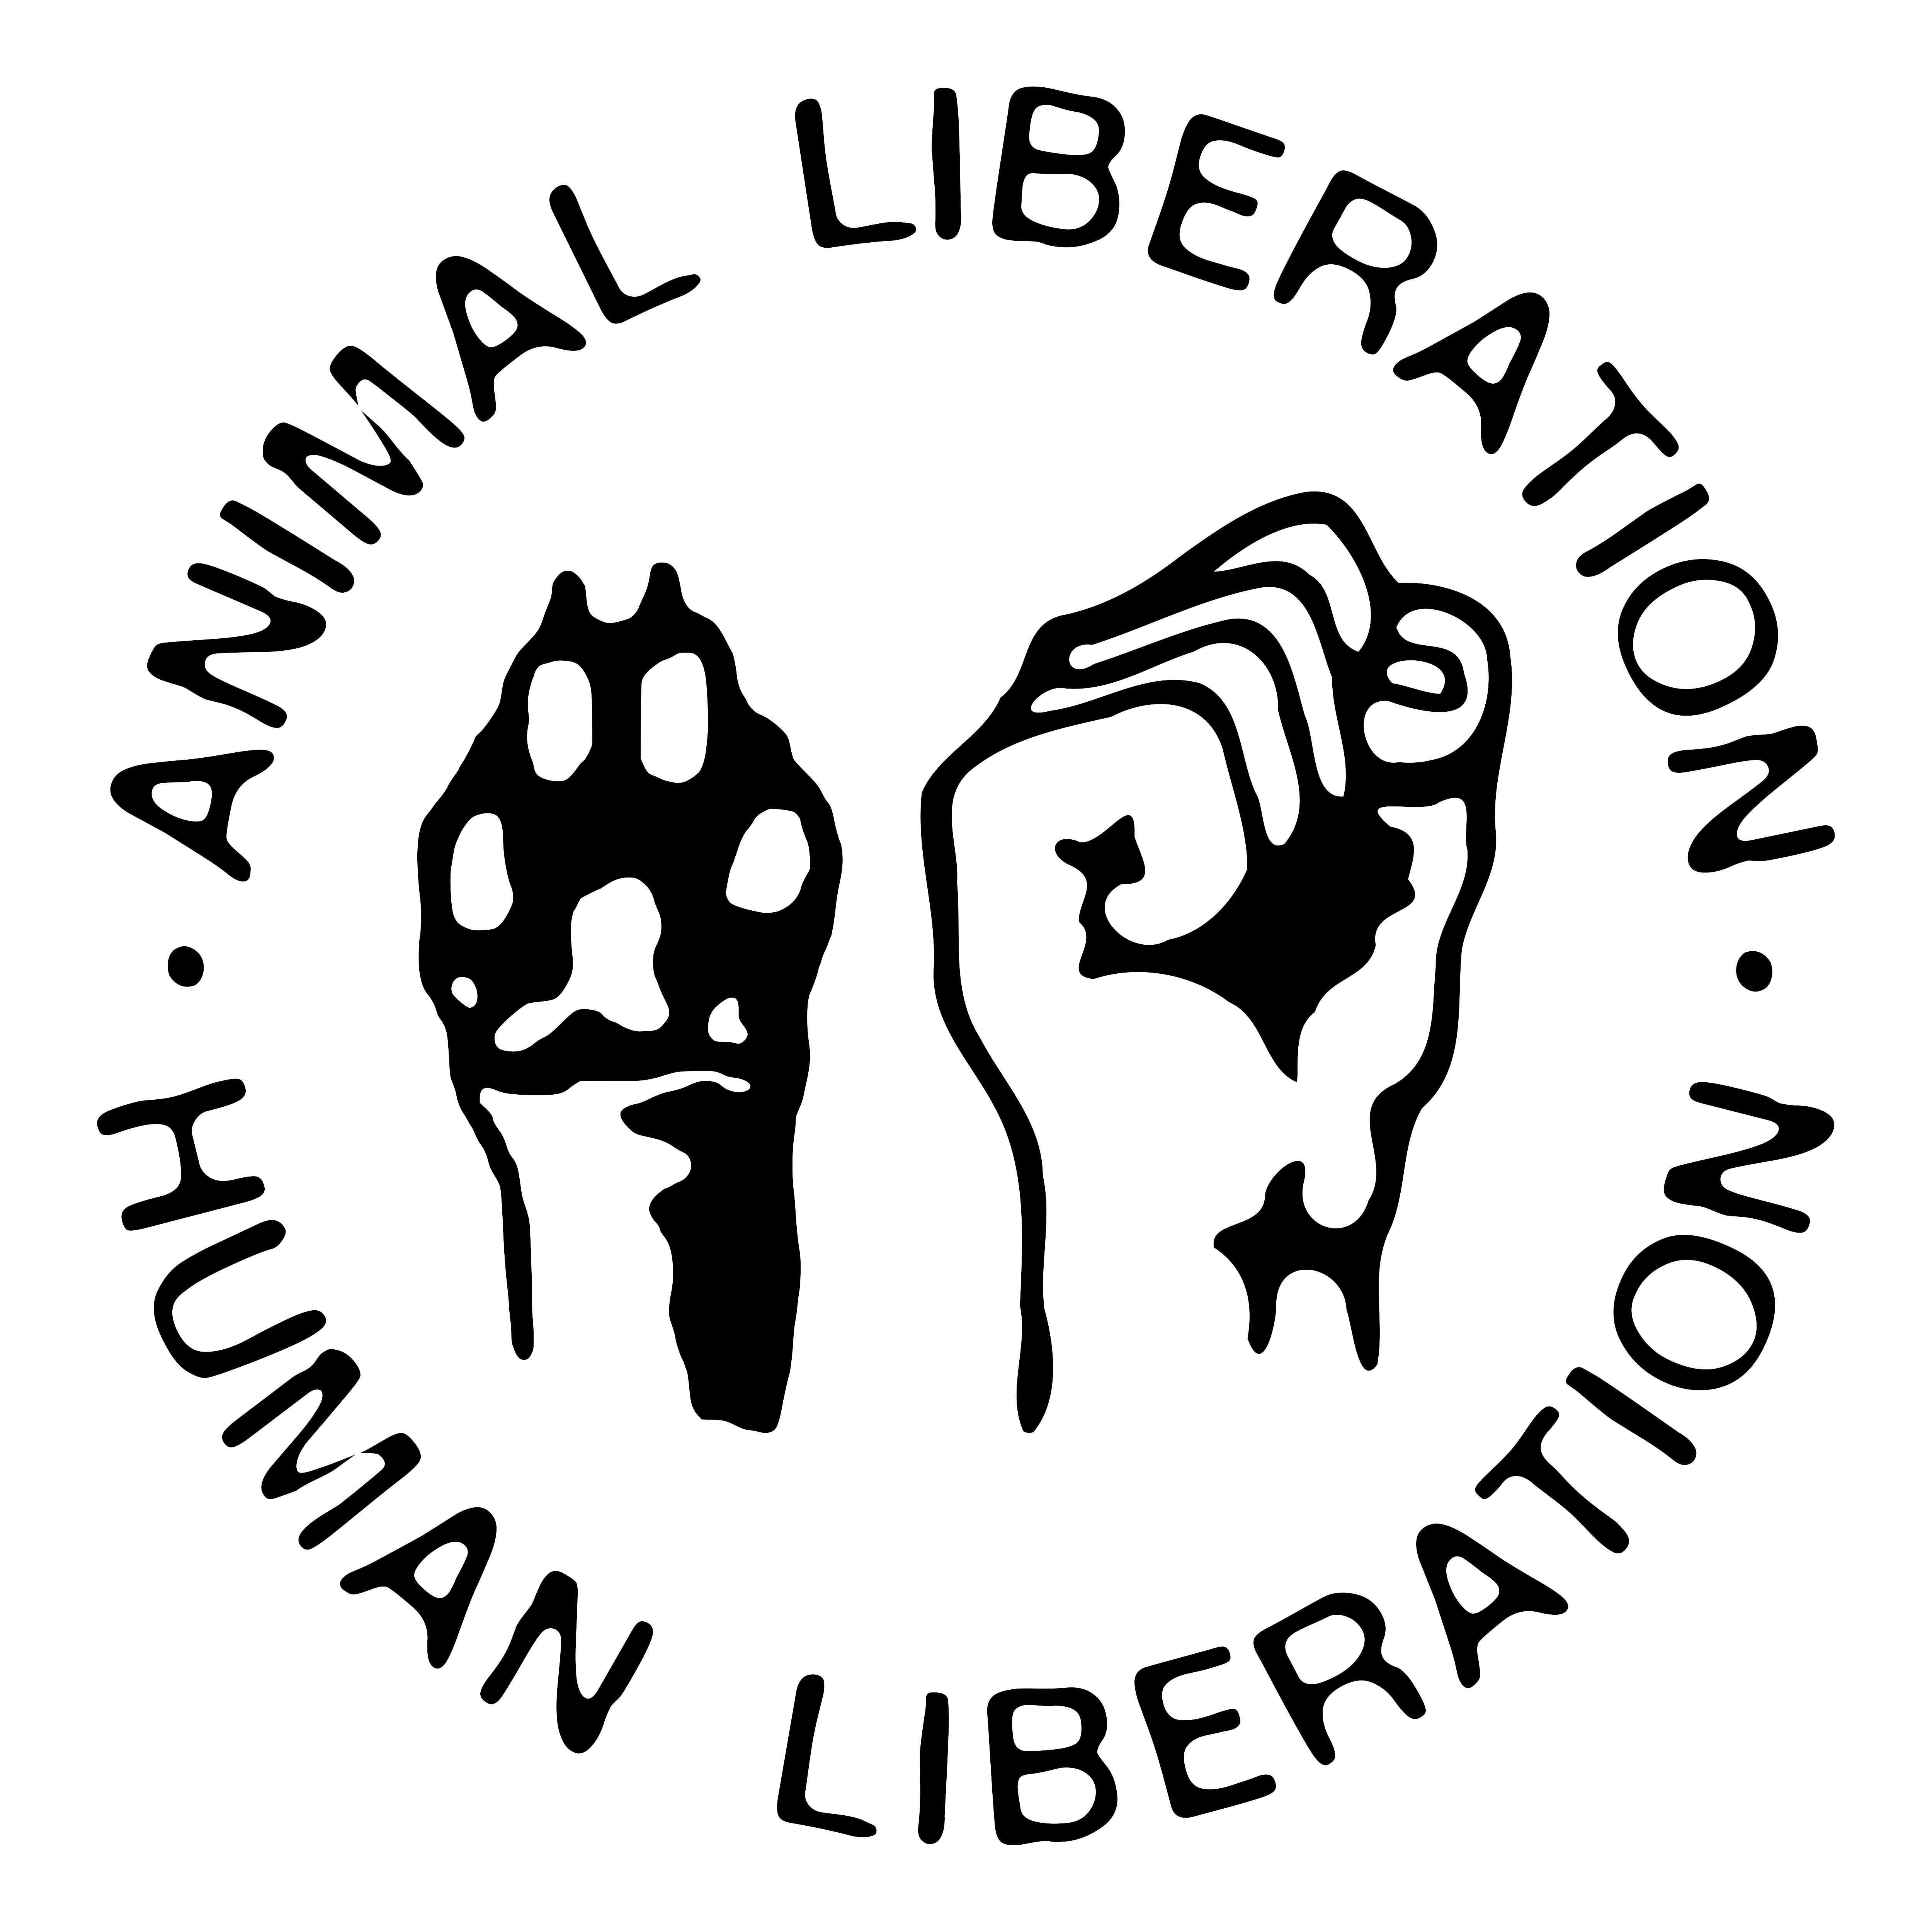 vegan symbol emojis copyright free clipart copypaste vegan symbol emojis copyright free clipart copypaste biocorpaavc